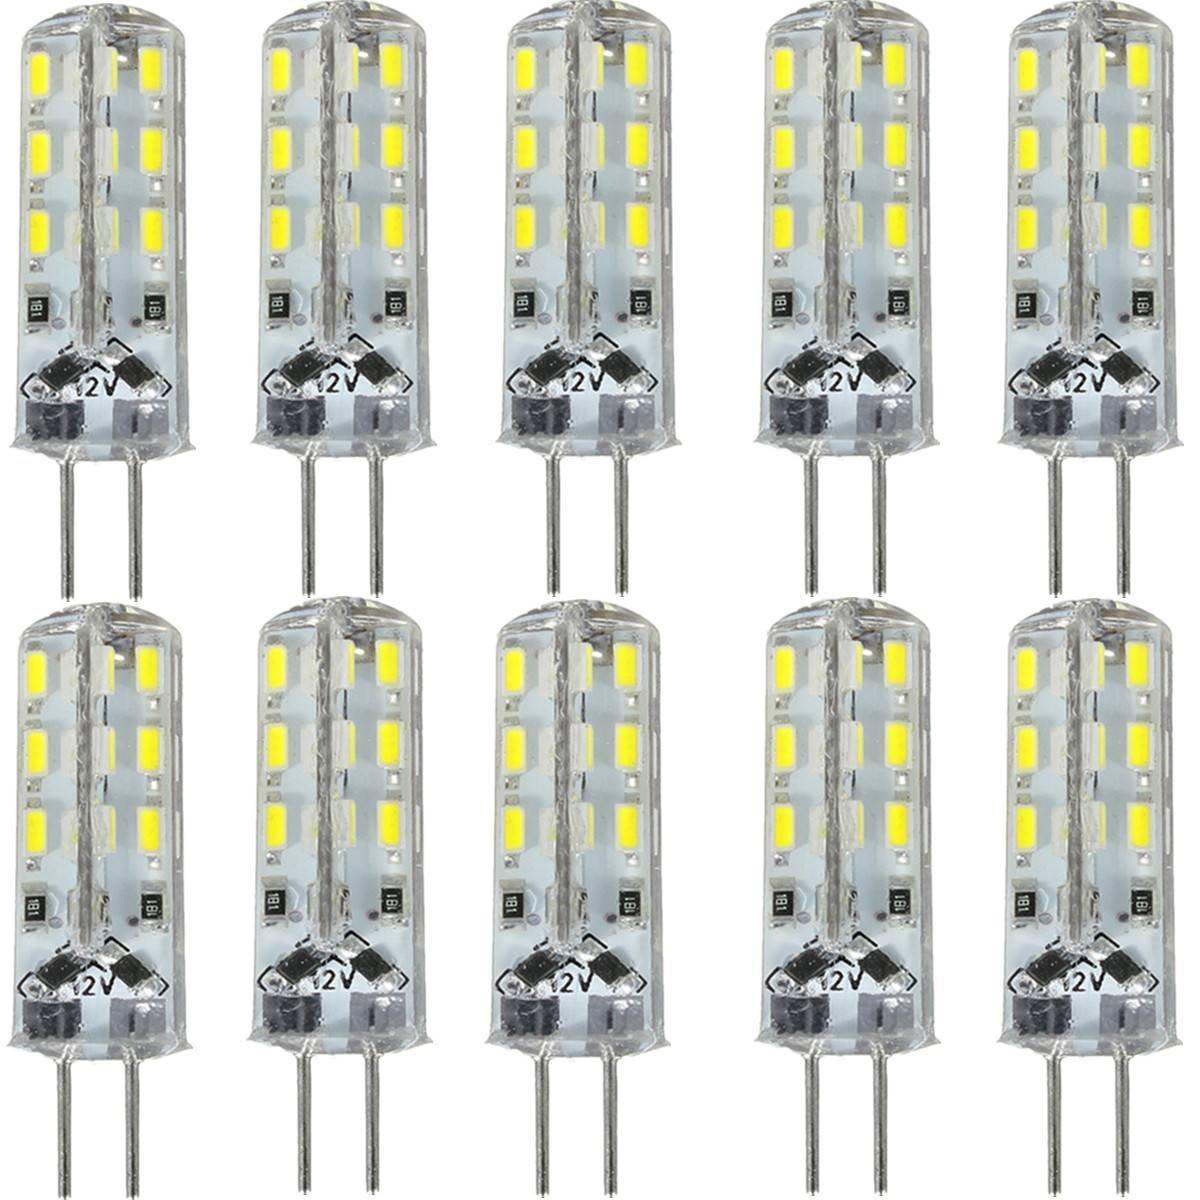 KingSo 10x G41,5W LED-Leuchtmittel kaltweiß entspricht einer 20-W-Halogenlampe omnidirektionales Licht 24SMD 3014DC 12V 6.000K 195 lm Strahler, Super-Hell, Energiesparend [Energieklasse A+] KingSo 10x G41